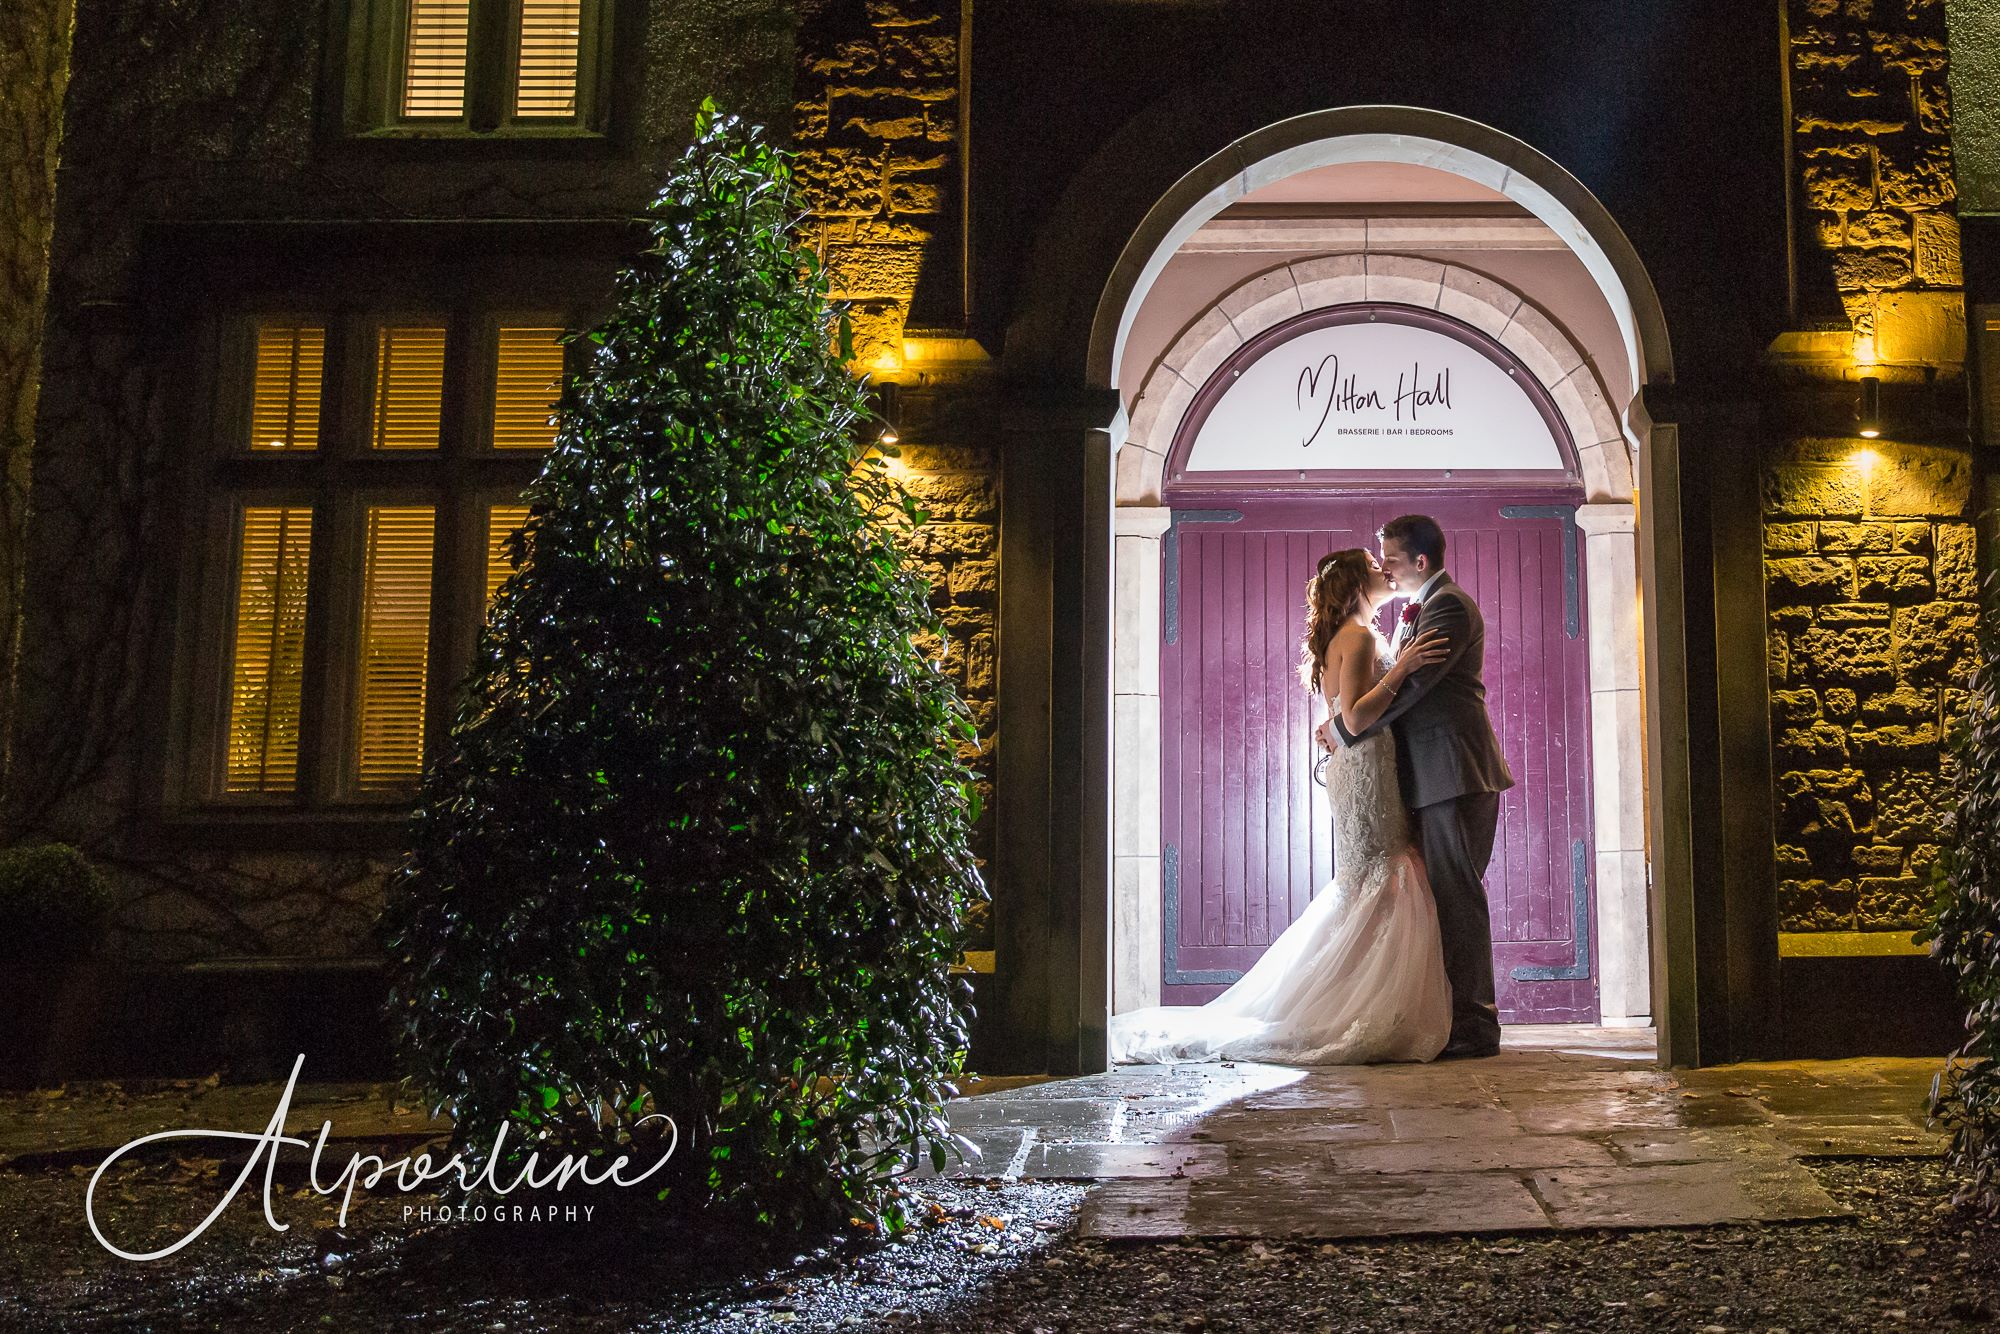 Mitton-hall-wedding-photograph-mitton-wedding-photographer.jpg